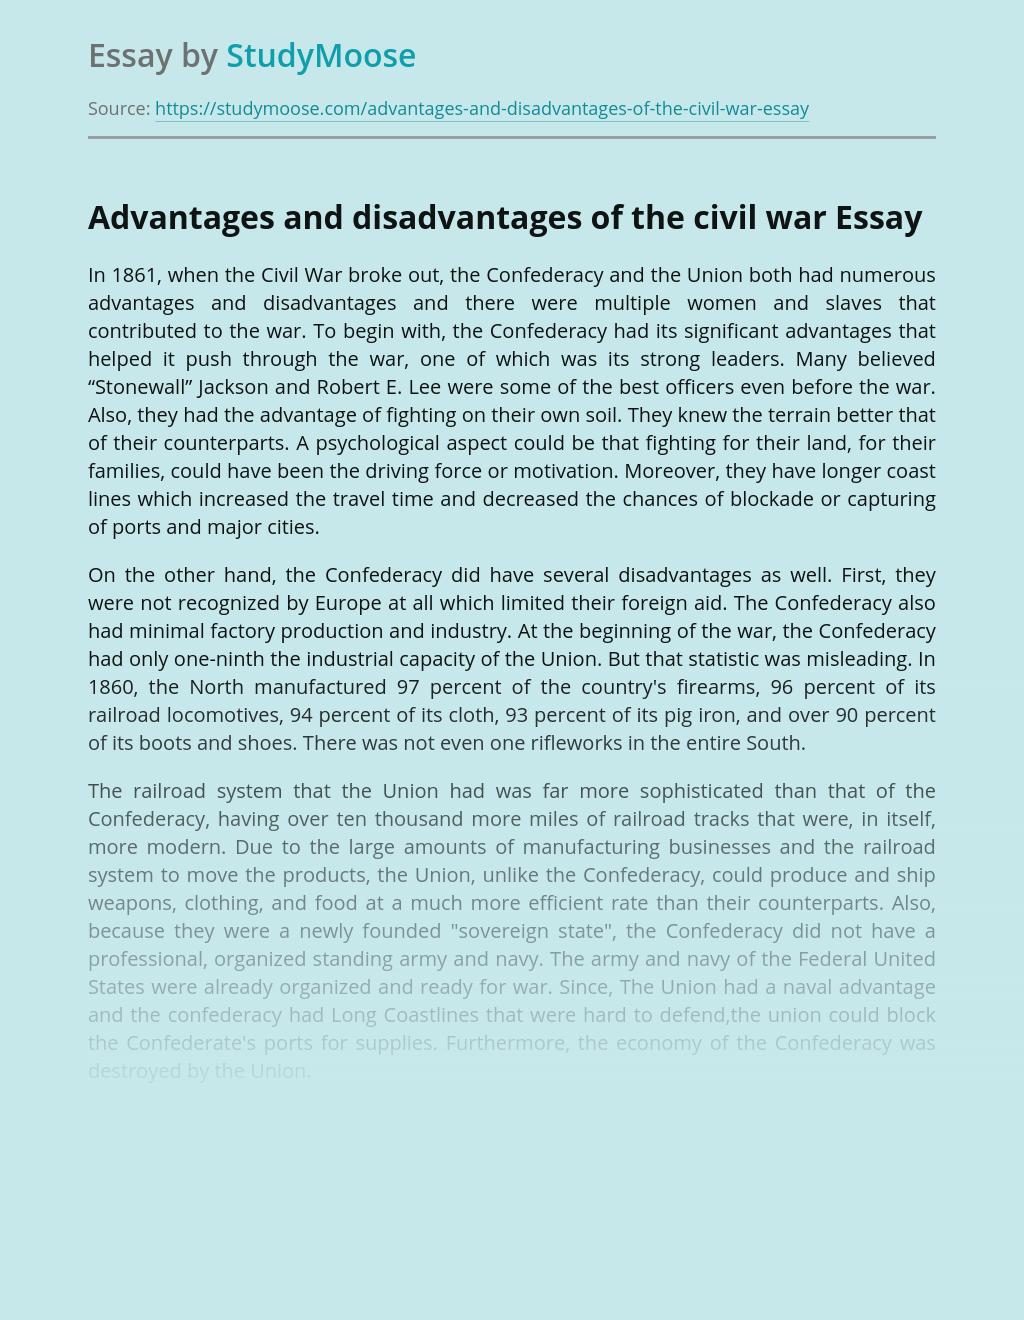 Advantages and disadvantages of the civil war